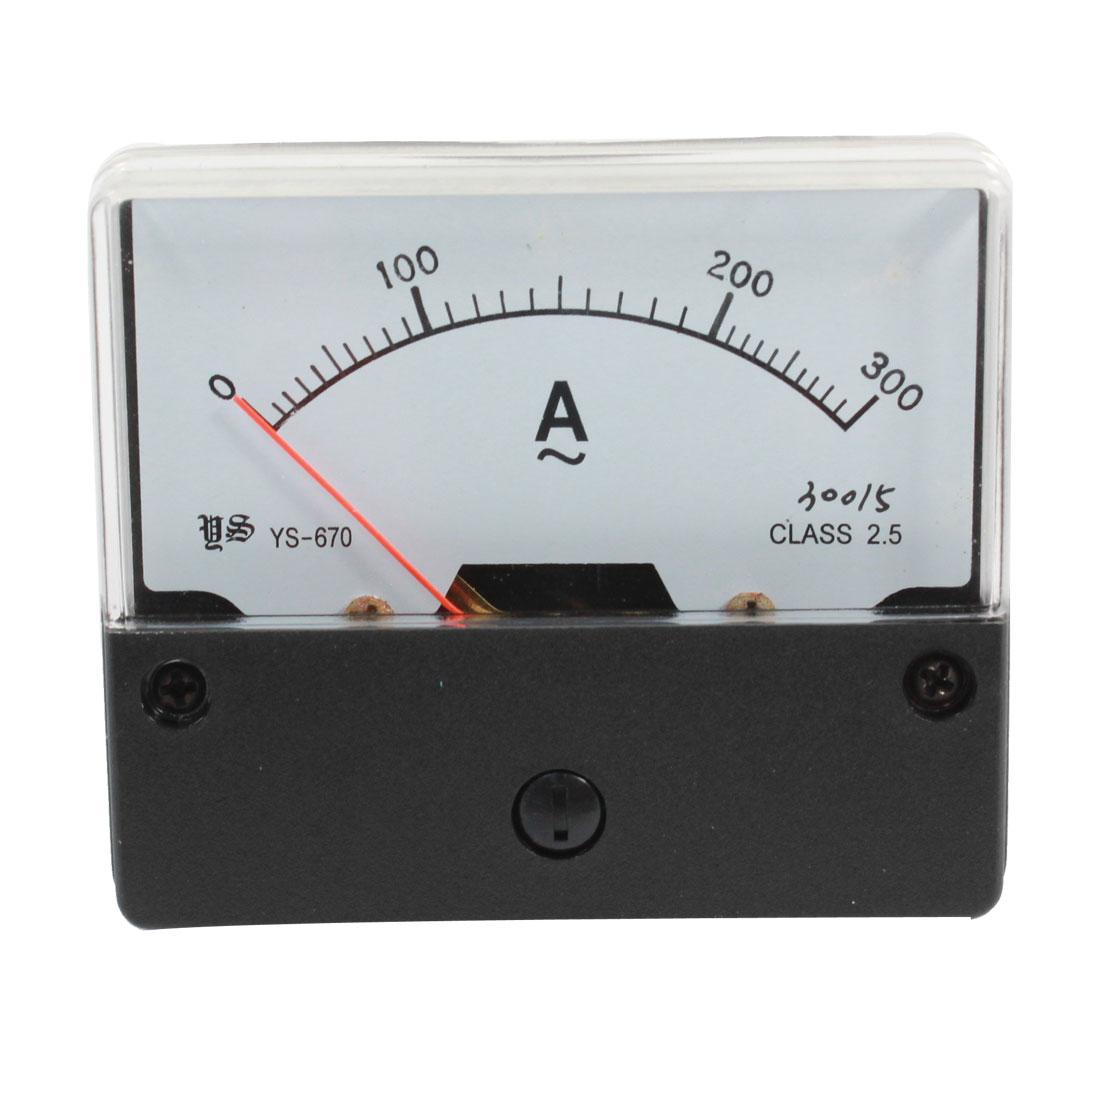 Class 2.5 AC 0-300A Fine Tuning Dial Alternating Test Panel Meter Ammeter Gauge